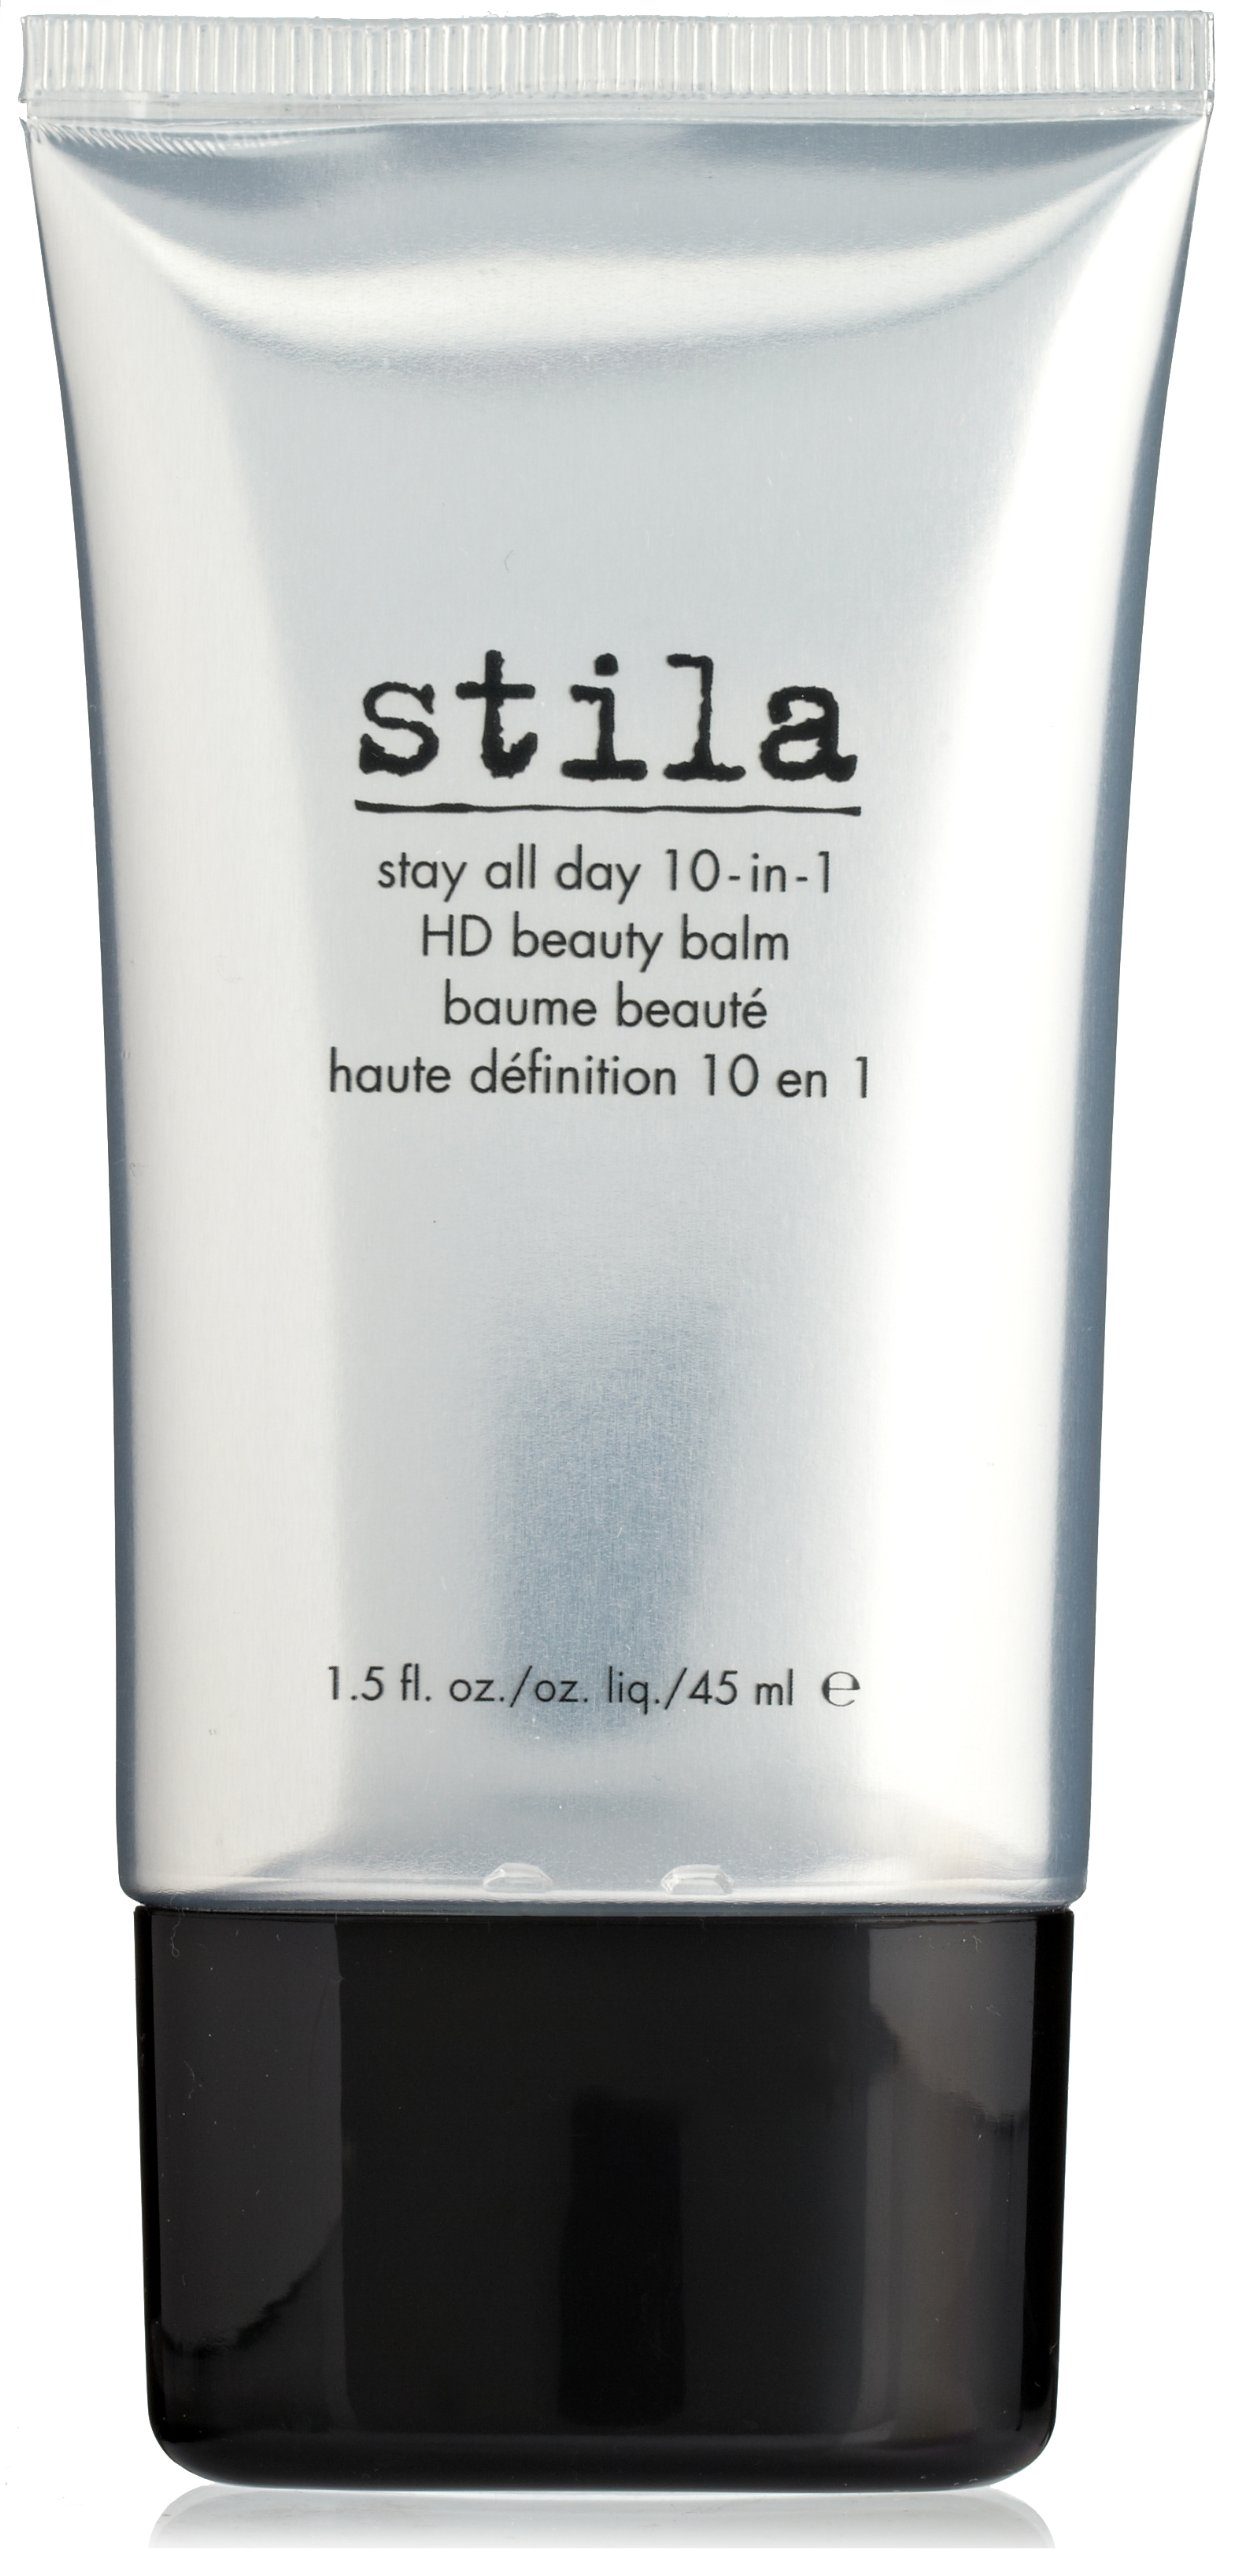 stila Stay All Day 10-in-1 HD Beauty Balm, 1.5 fl. oz.